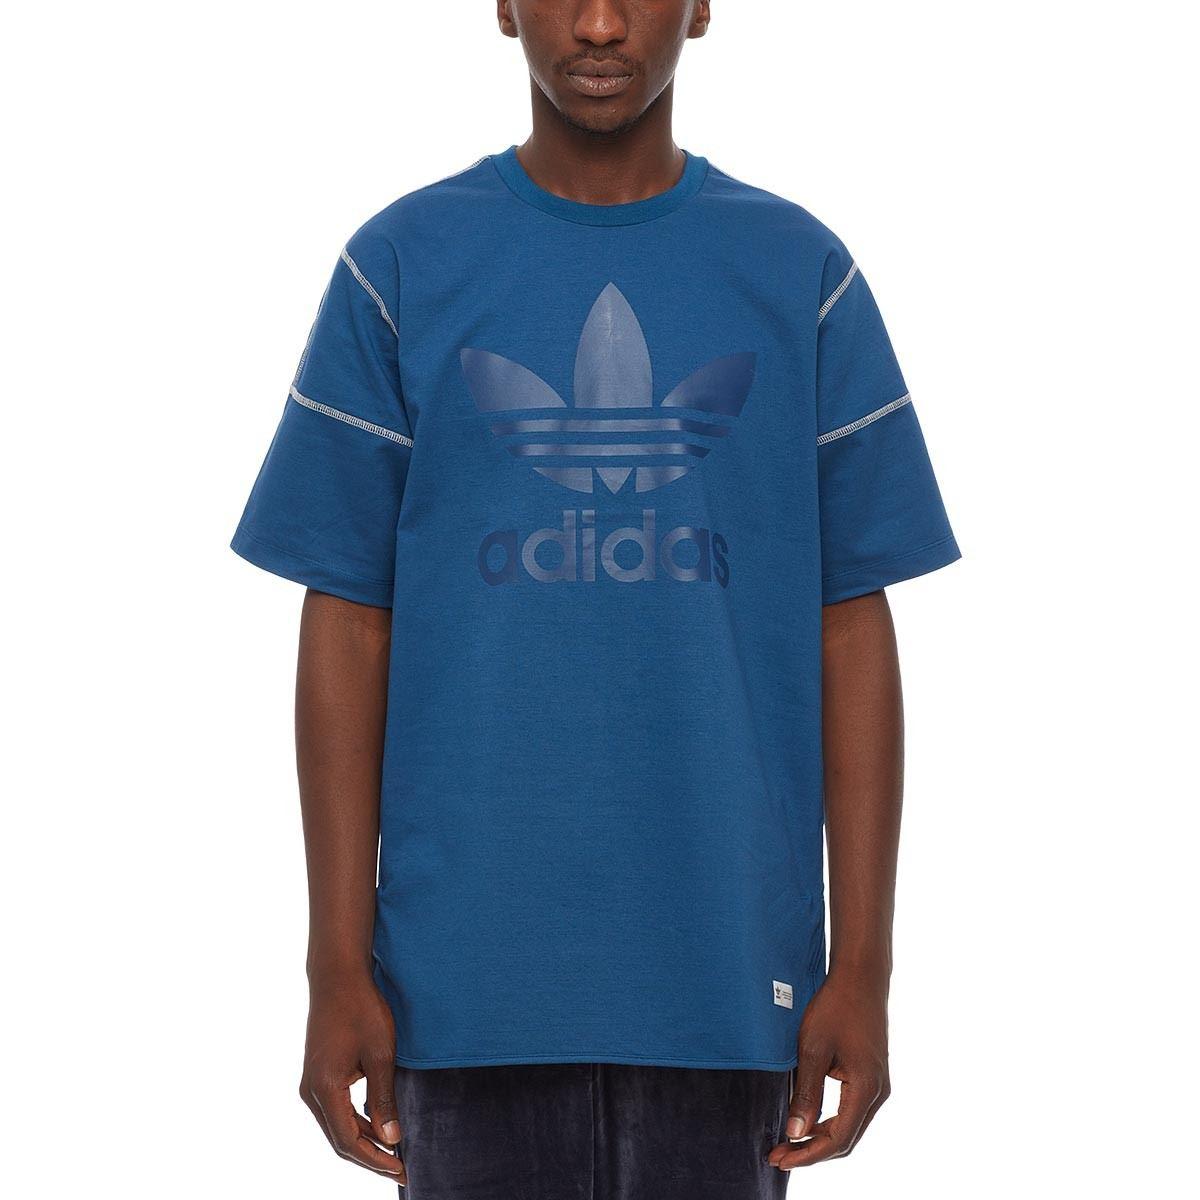 Adidas ORIGINALS FREIZEIT T SHIRT bleu TREFOIL XS S M L XL CREW NECK TOP  hommes 94dcfed7b8b2